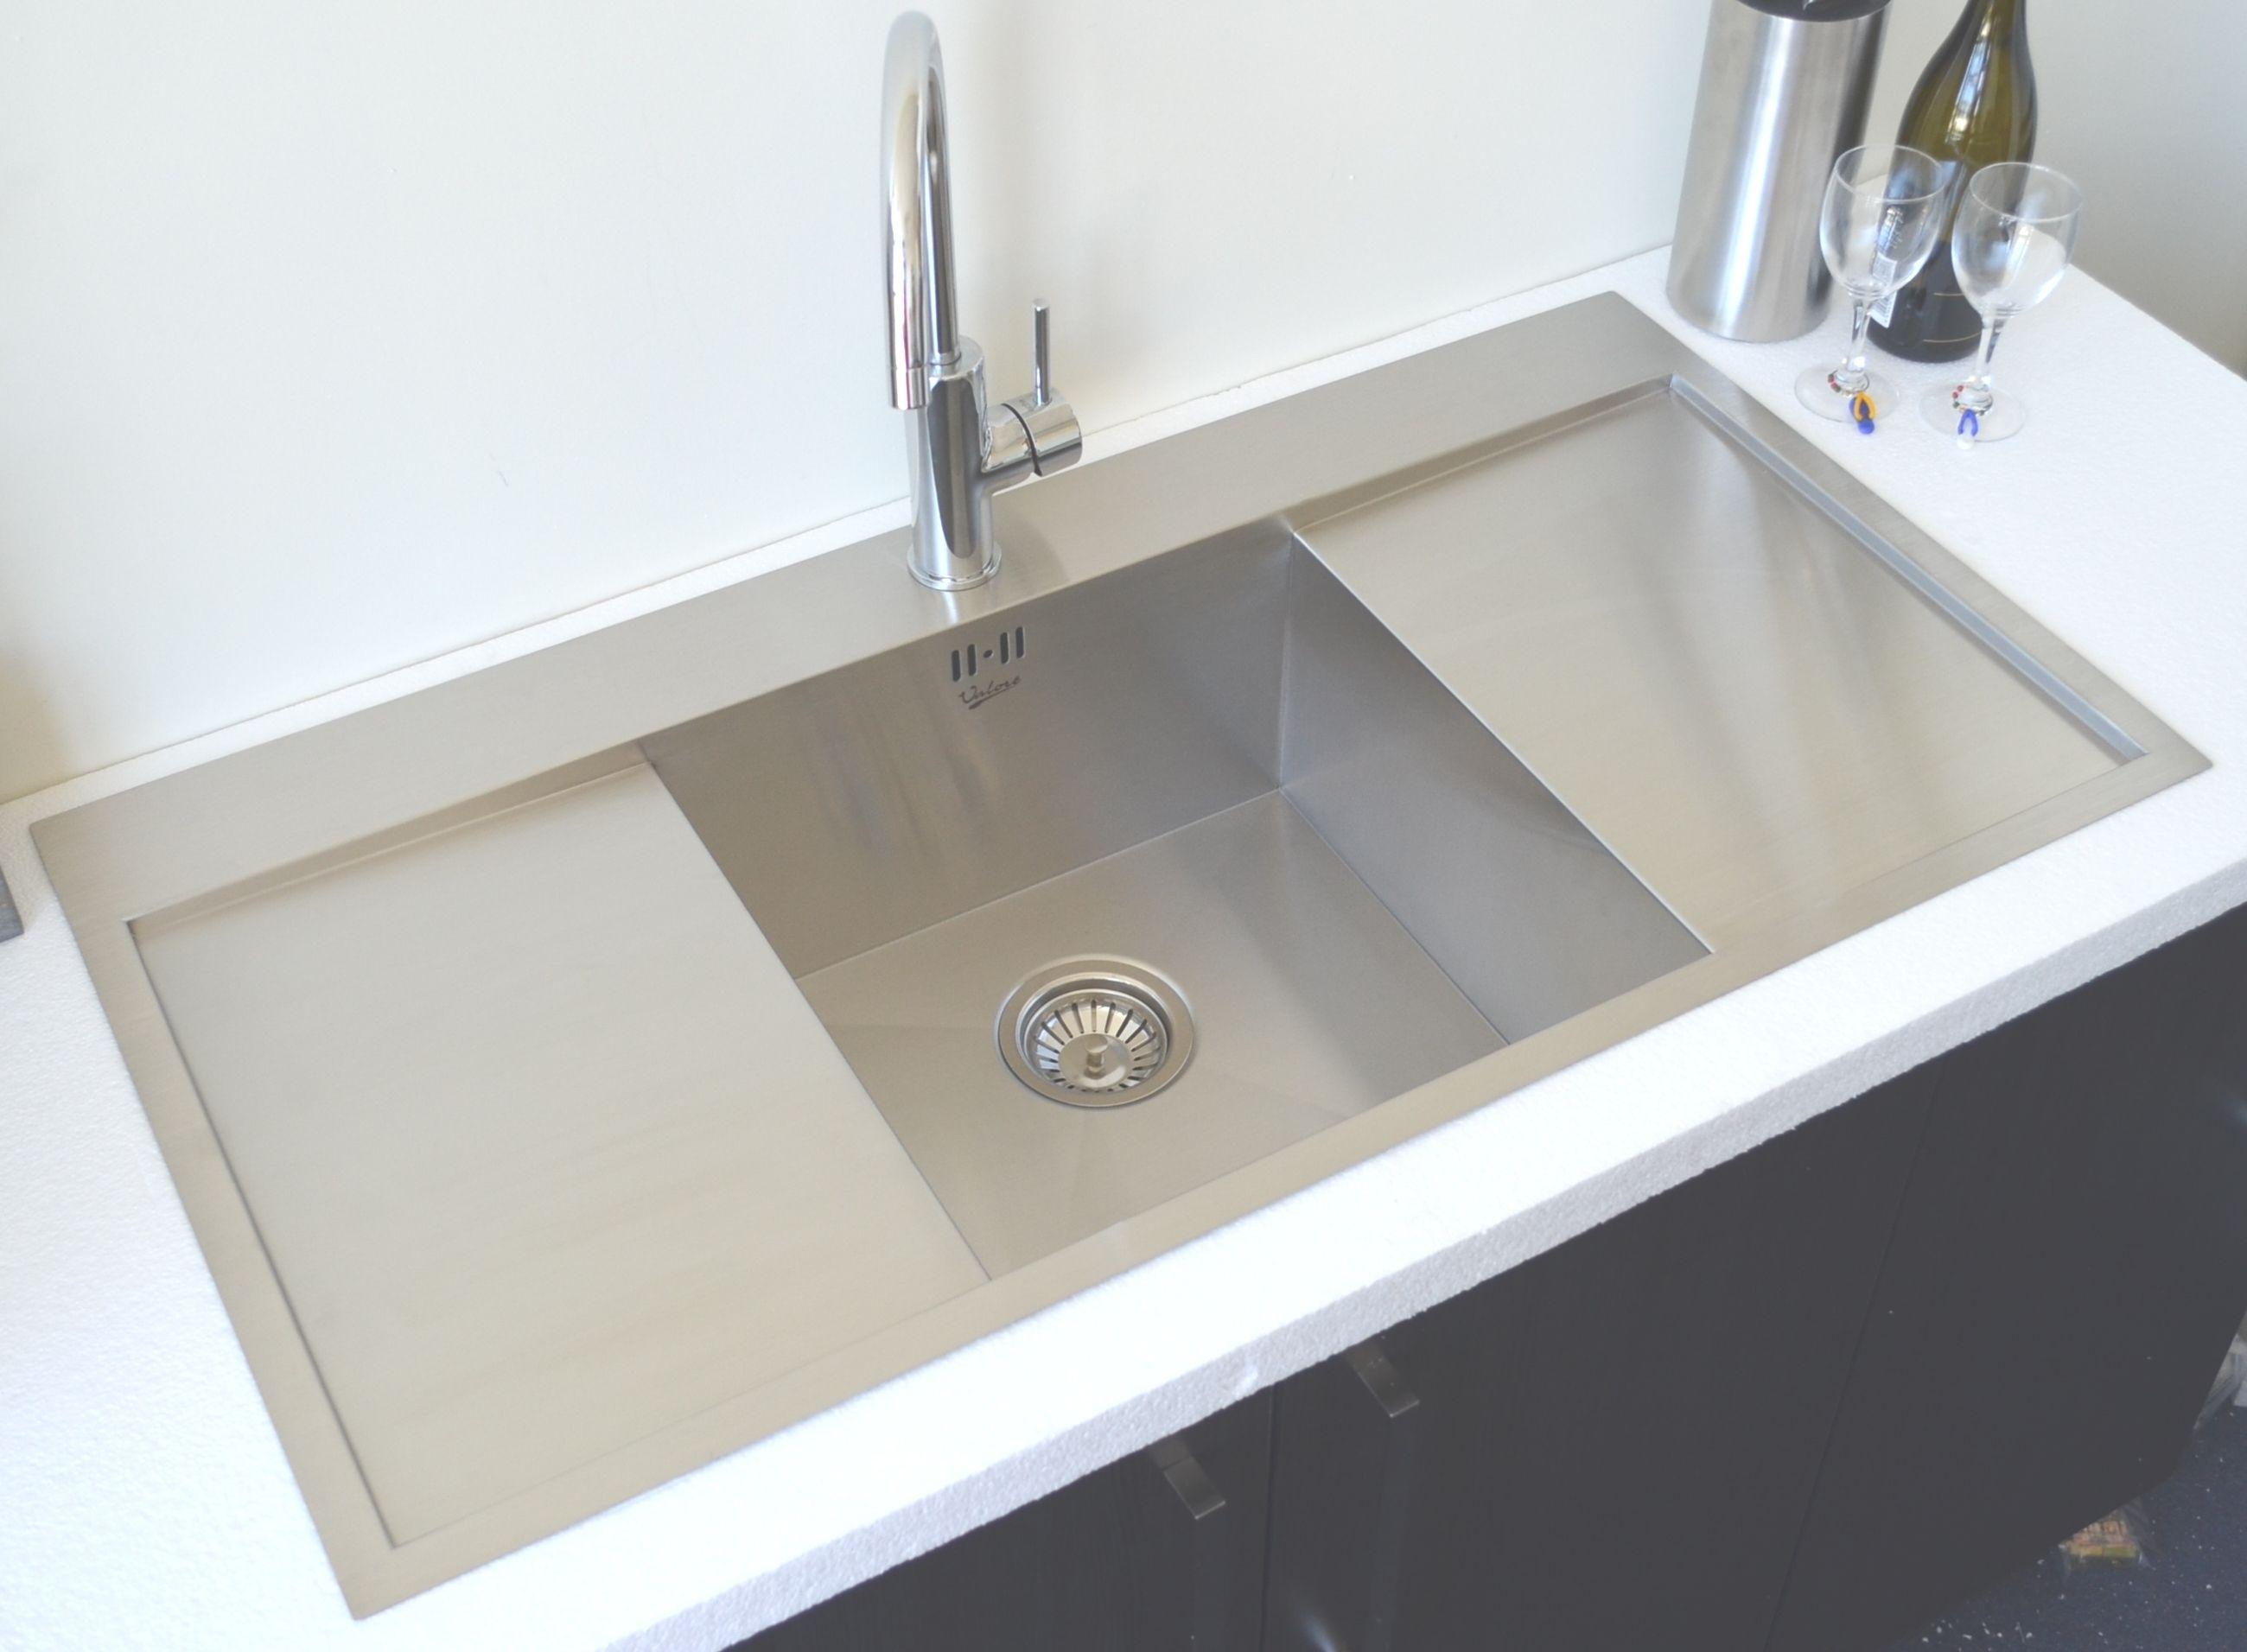 Valore Sinks Sink Home Decor Decor